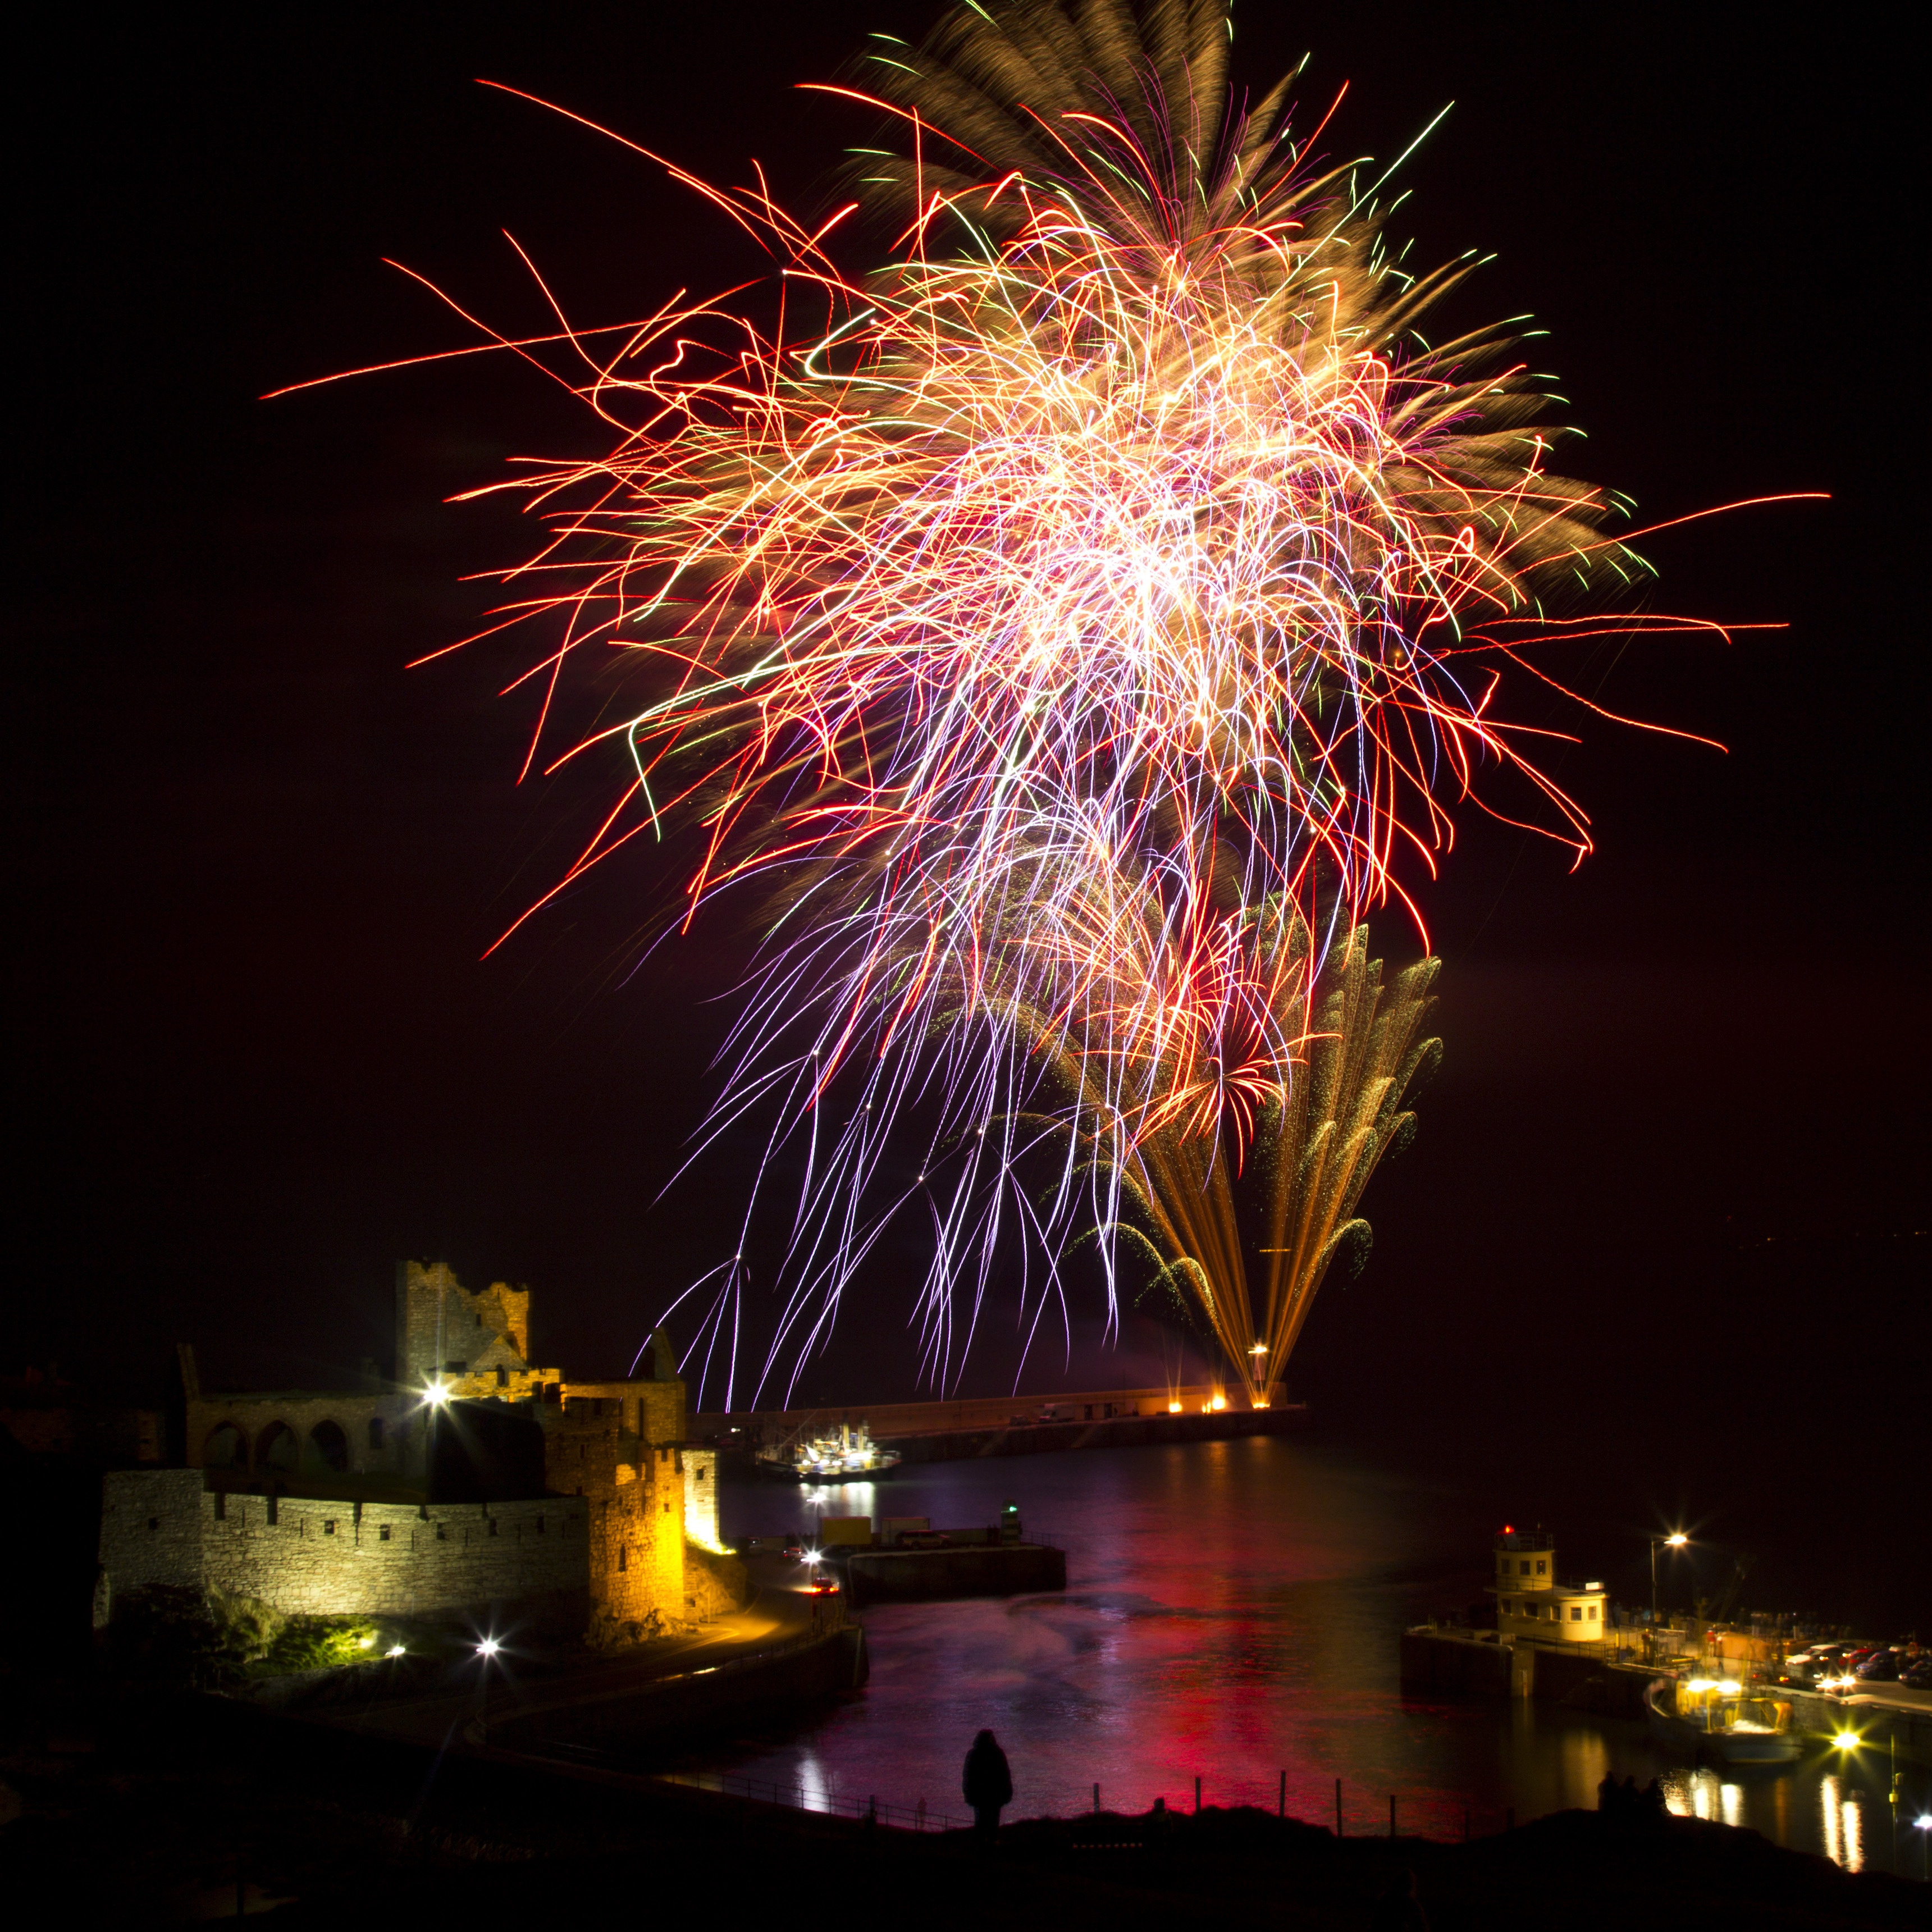 Winner: Fireworks, by Dani Coombes